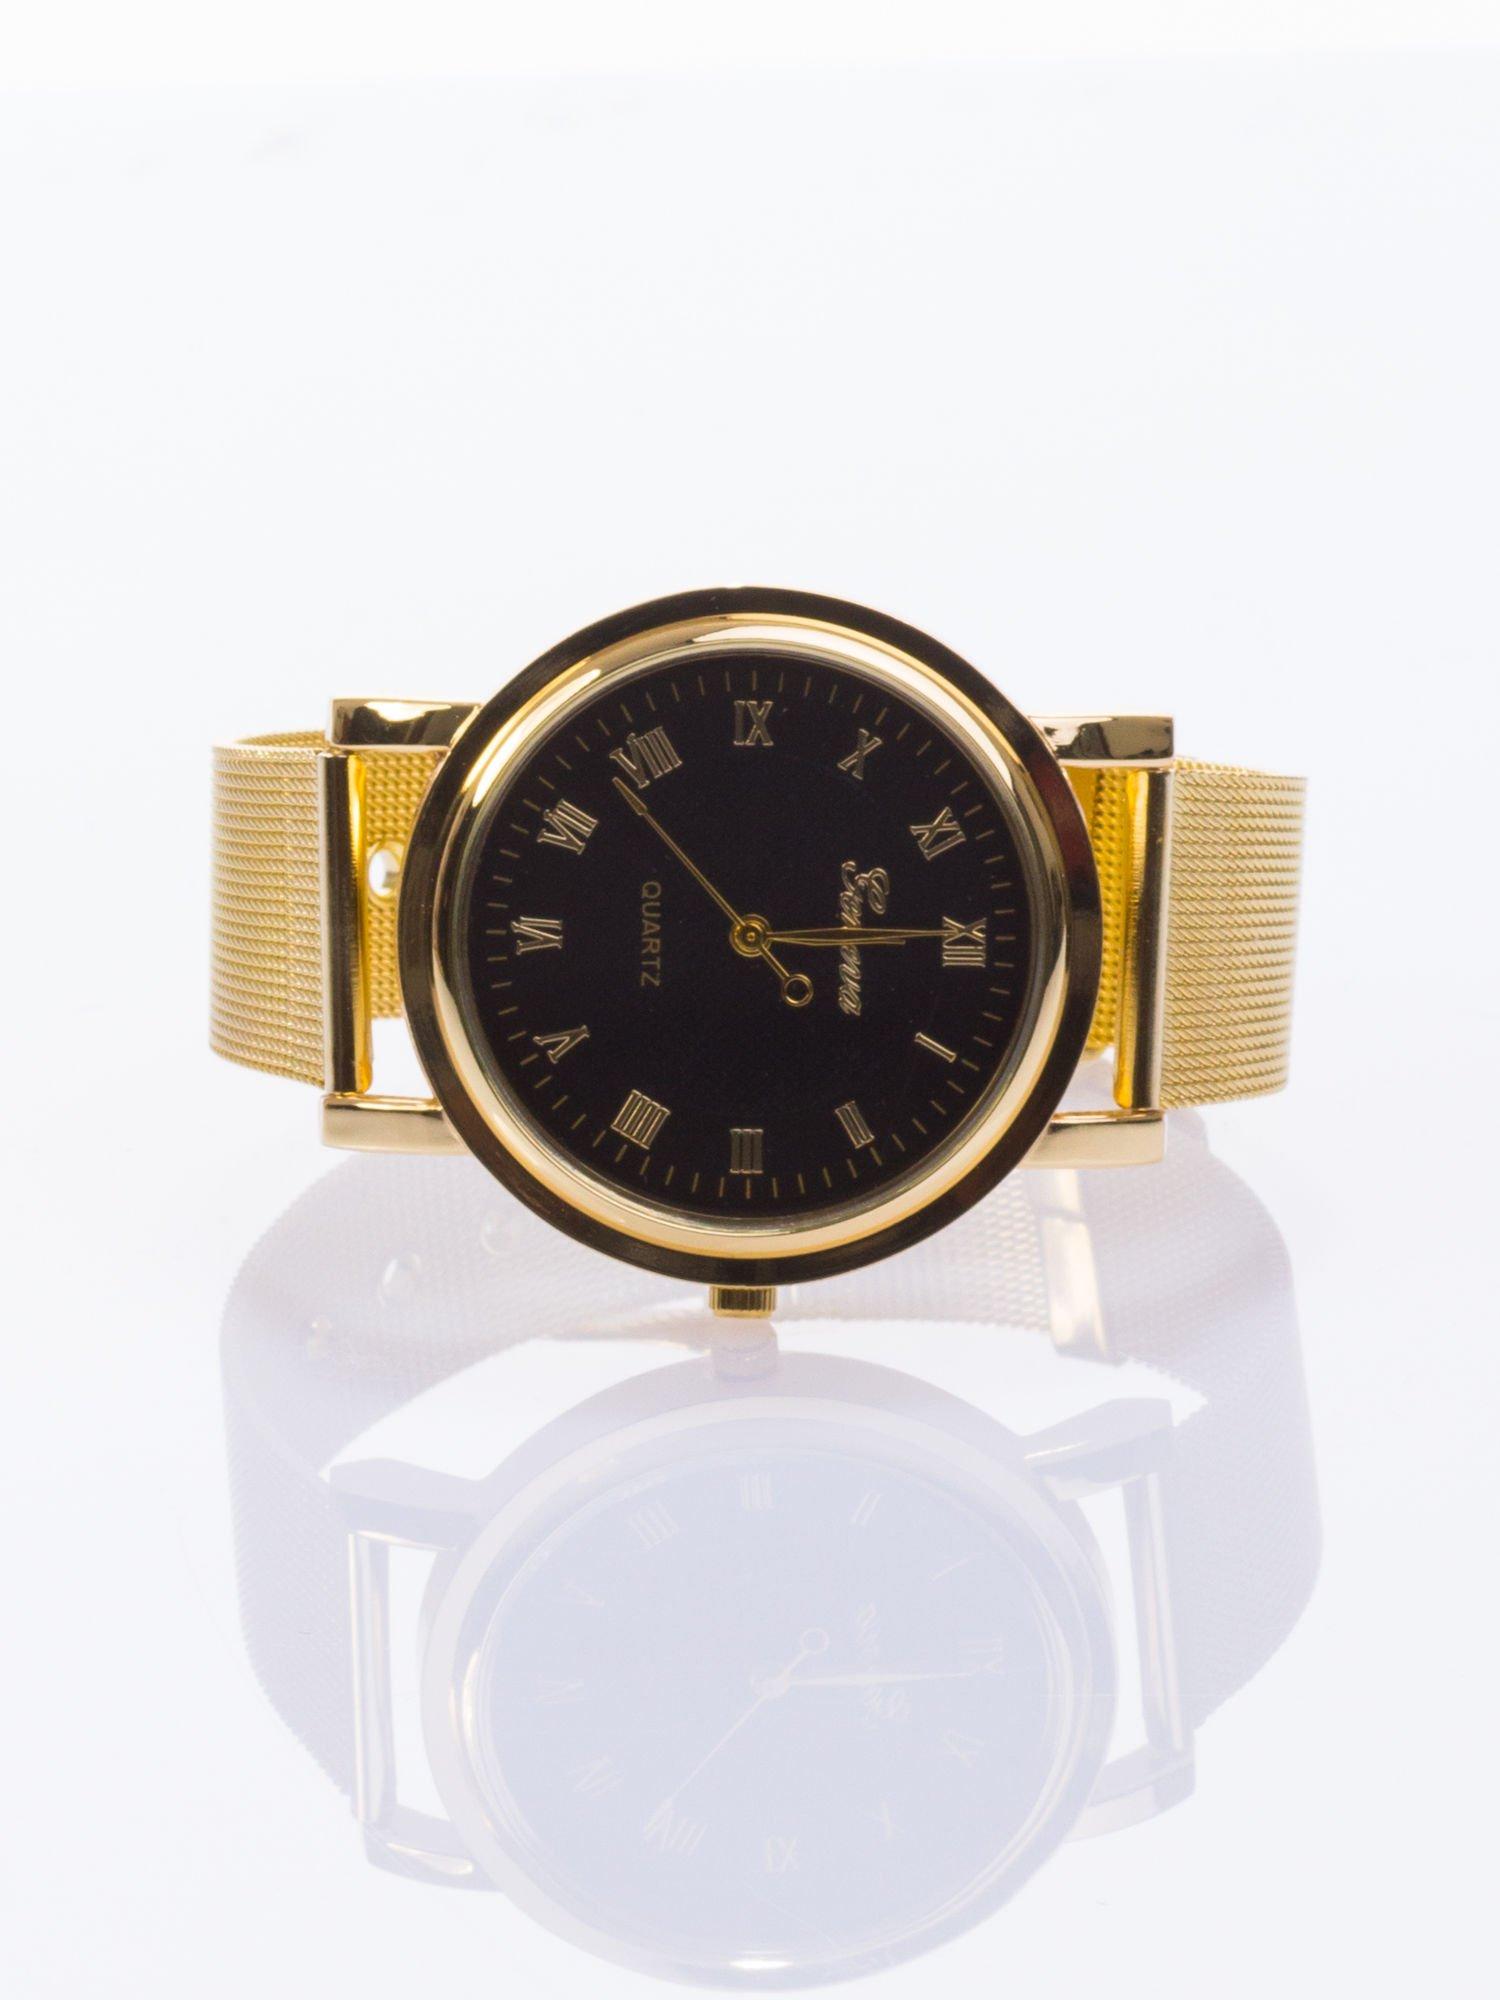 GENEVA Klasyczny zegarek Geneva metalowej bransolecie                                  zdj.                                  1